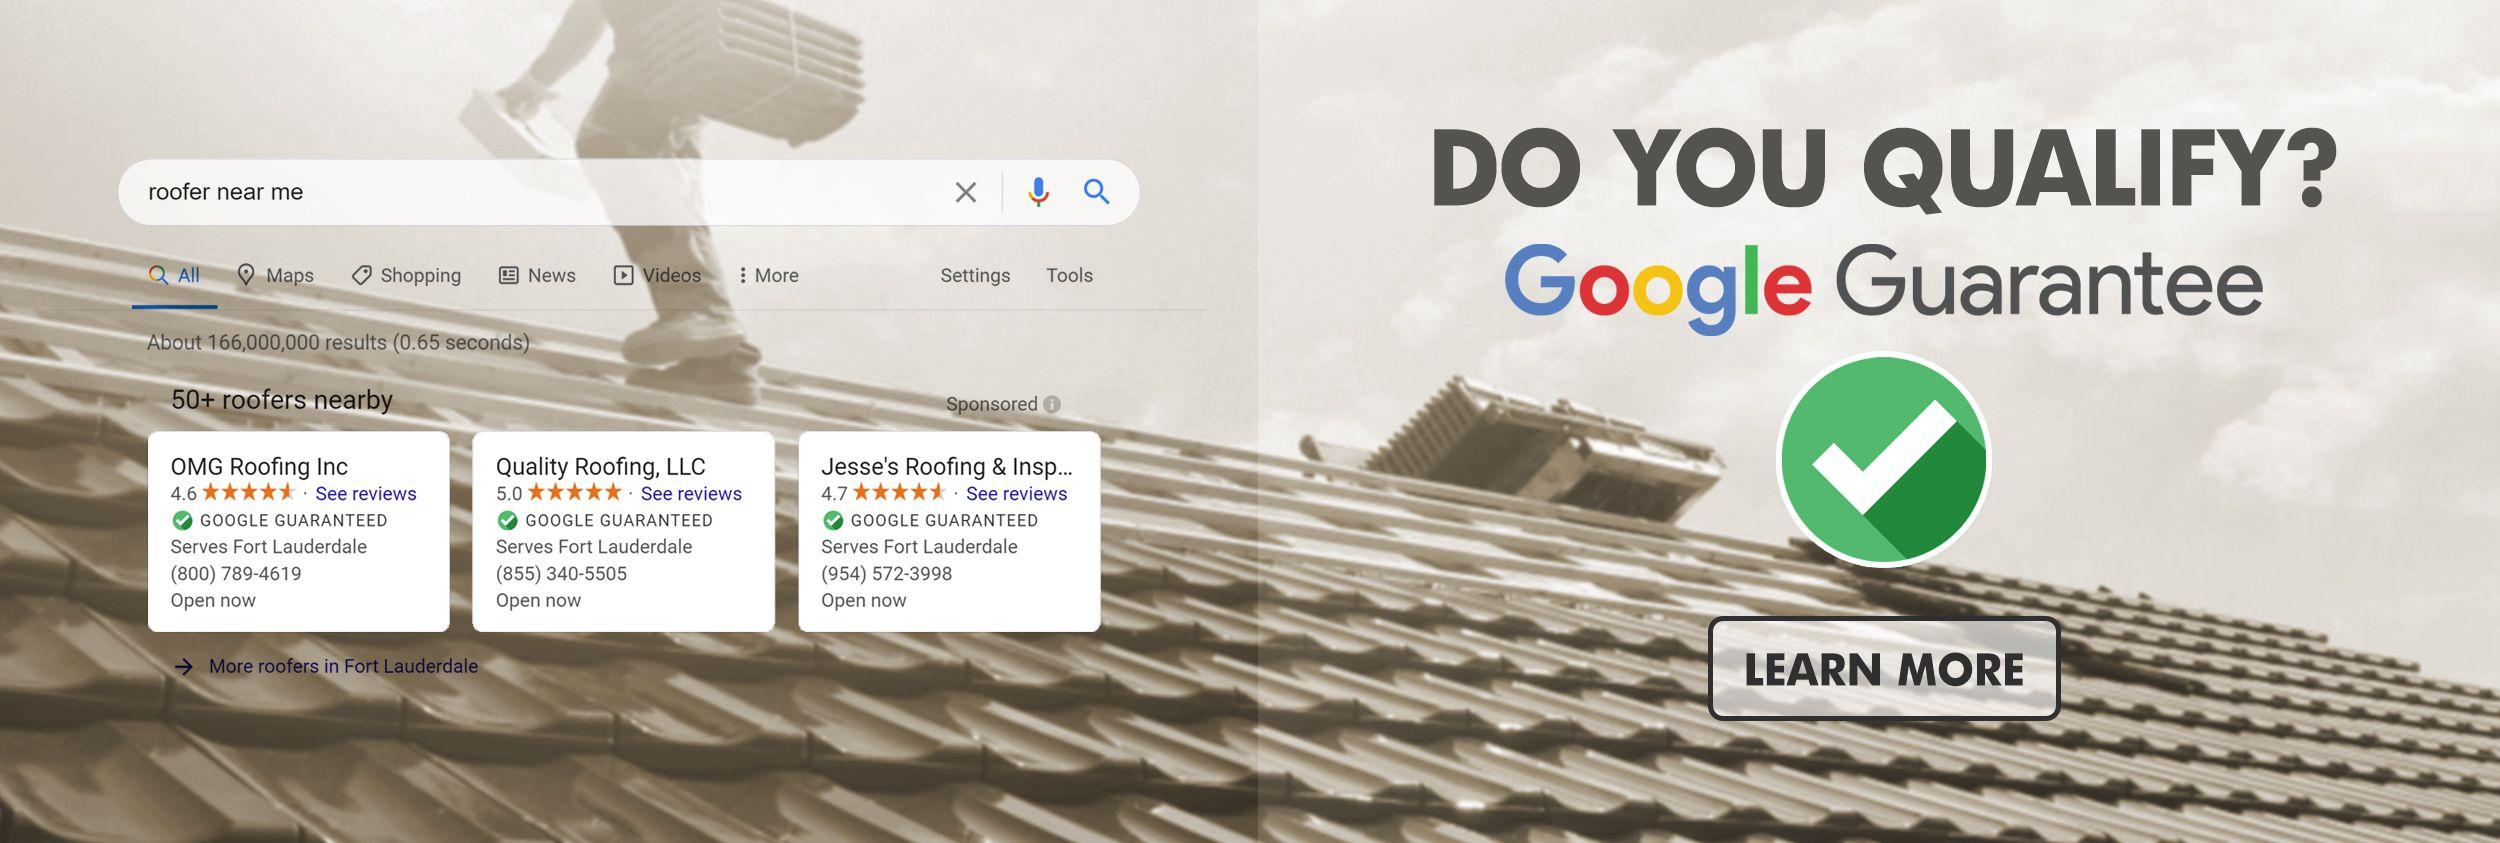 Home Services: Google Guarantee